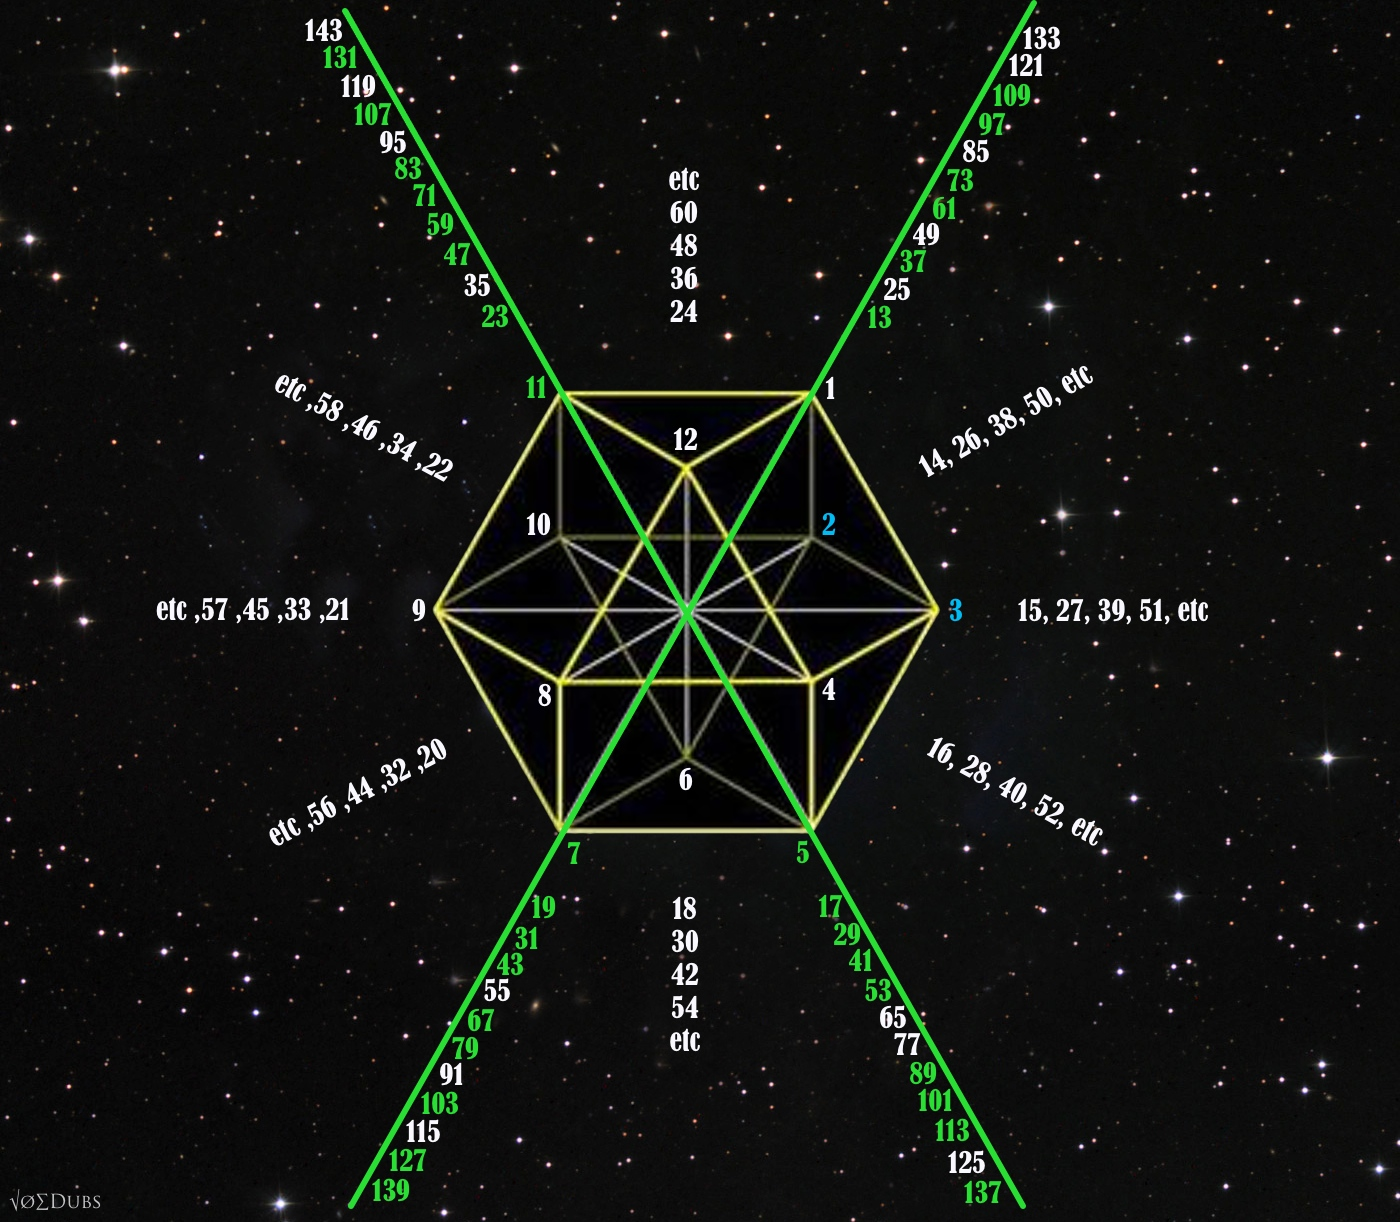 https://i1.wp.com/joedubs.com/wp-content/uploads/2015/02/Prime-Vector-Equilibrium.jpg